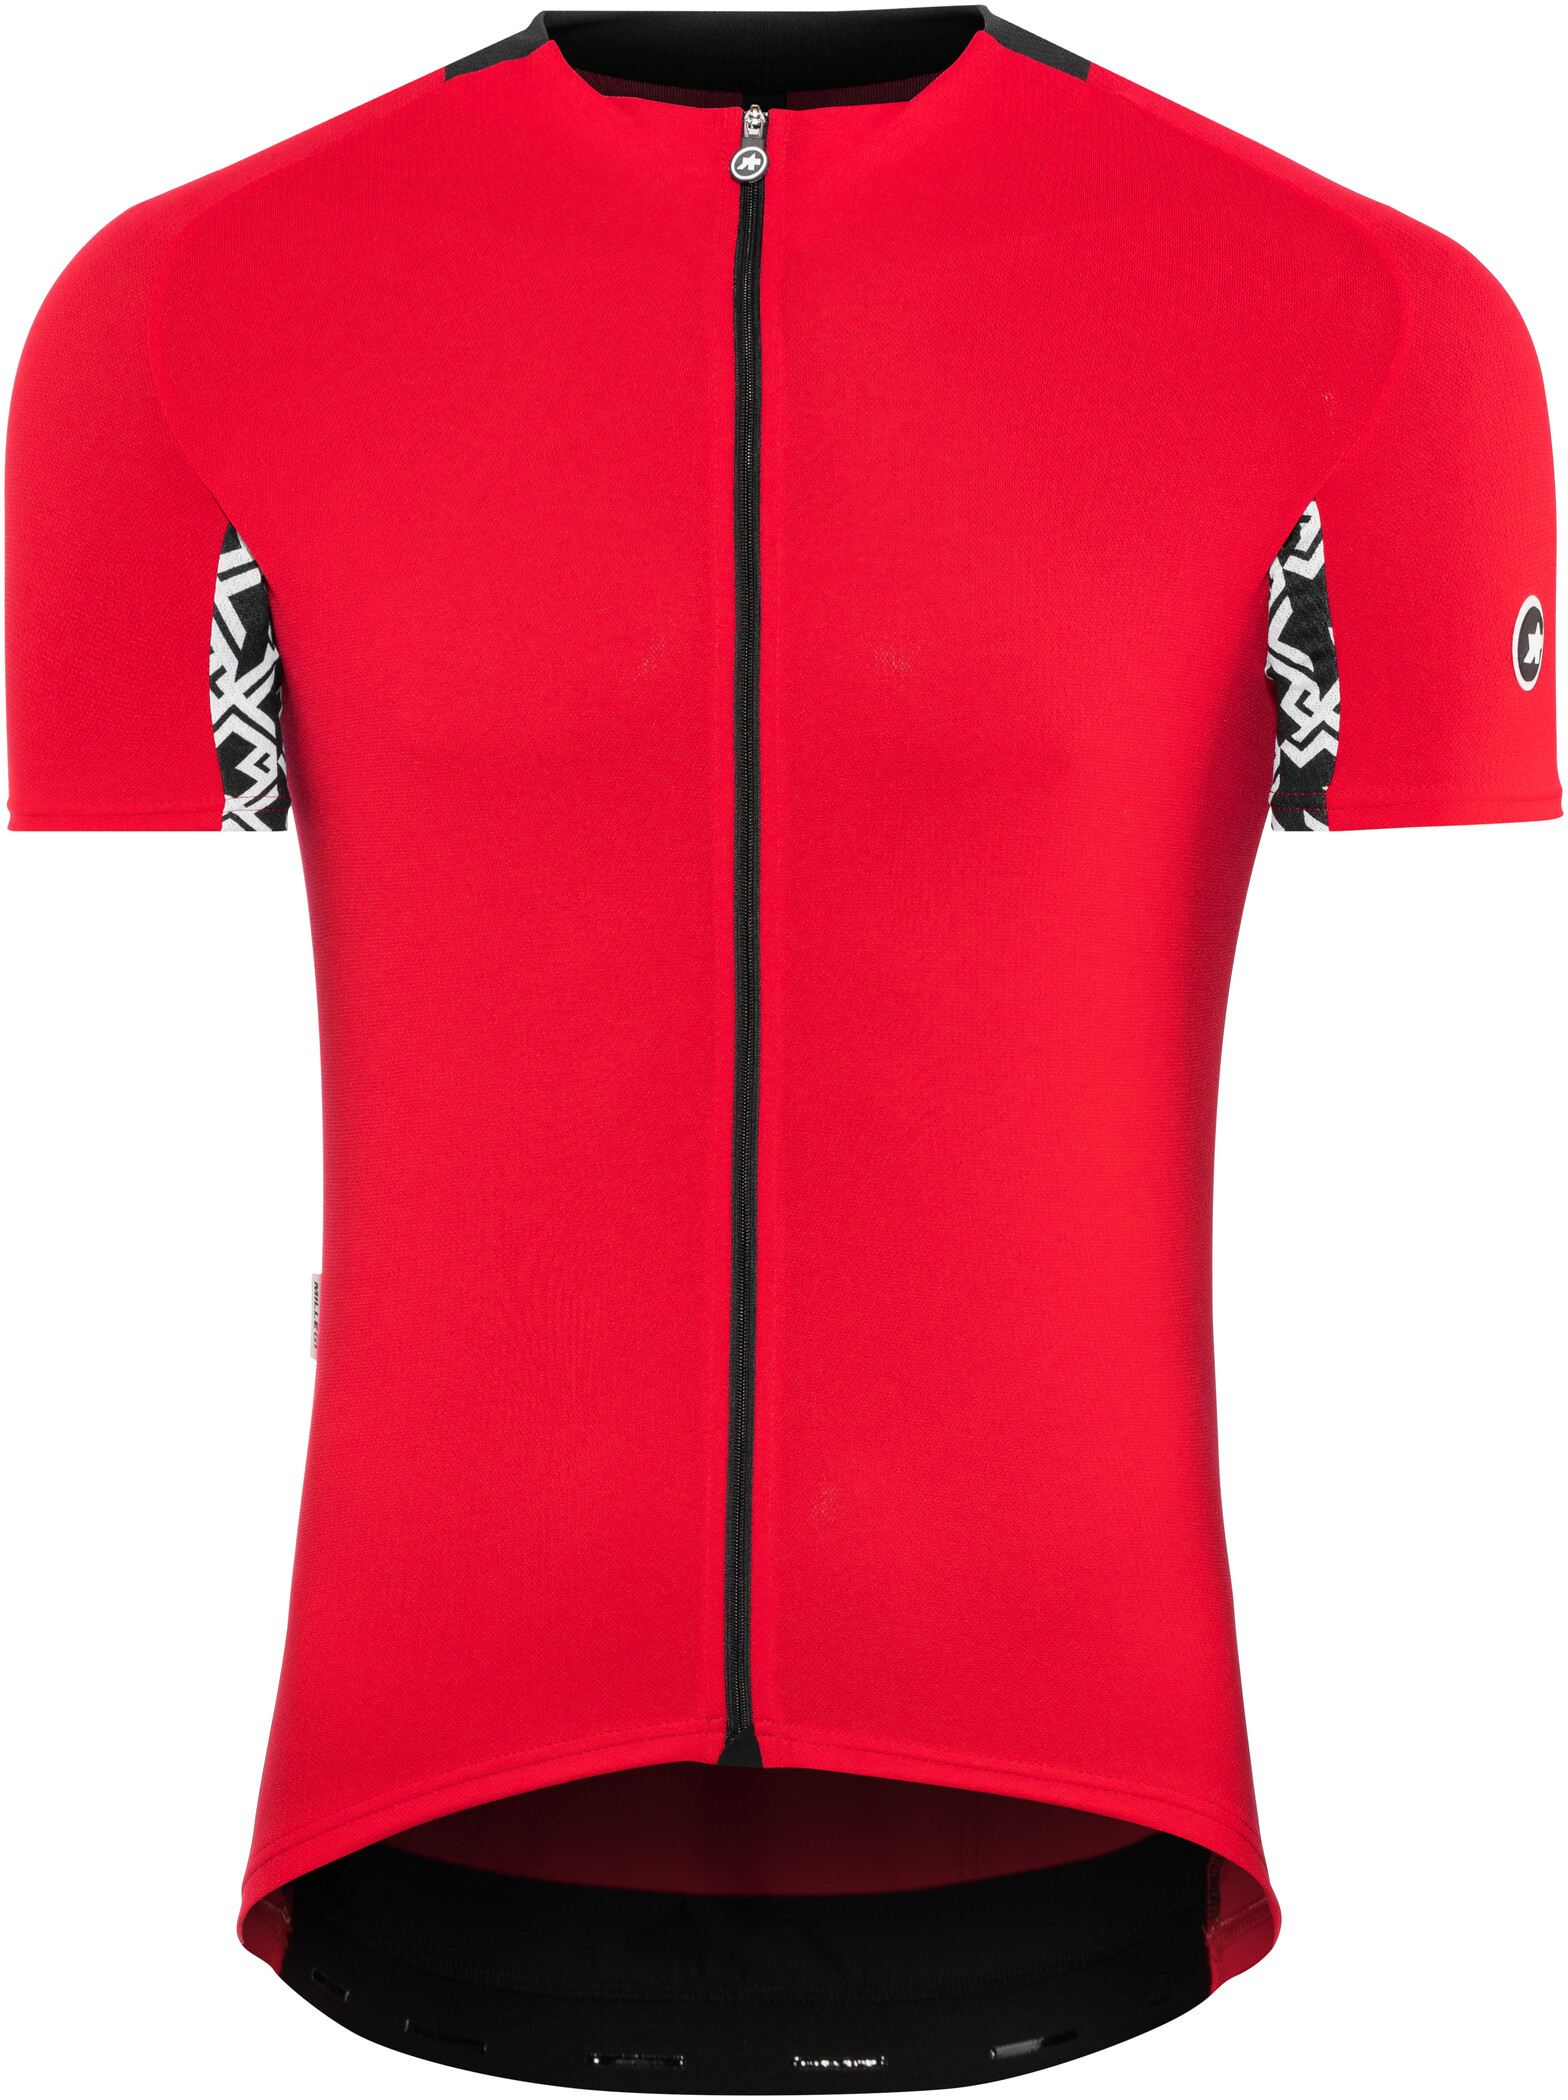 assos Mille GT Cykeltrøje Herrer, national red (2019) | Jerseys